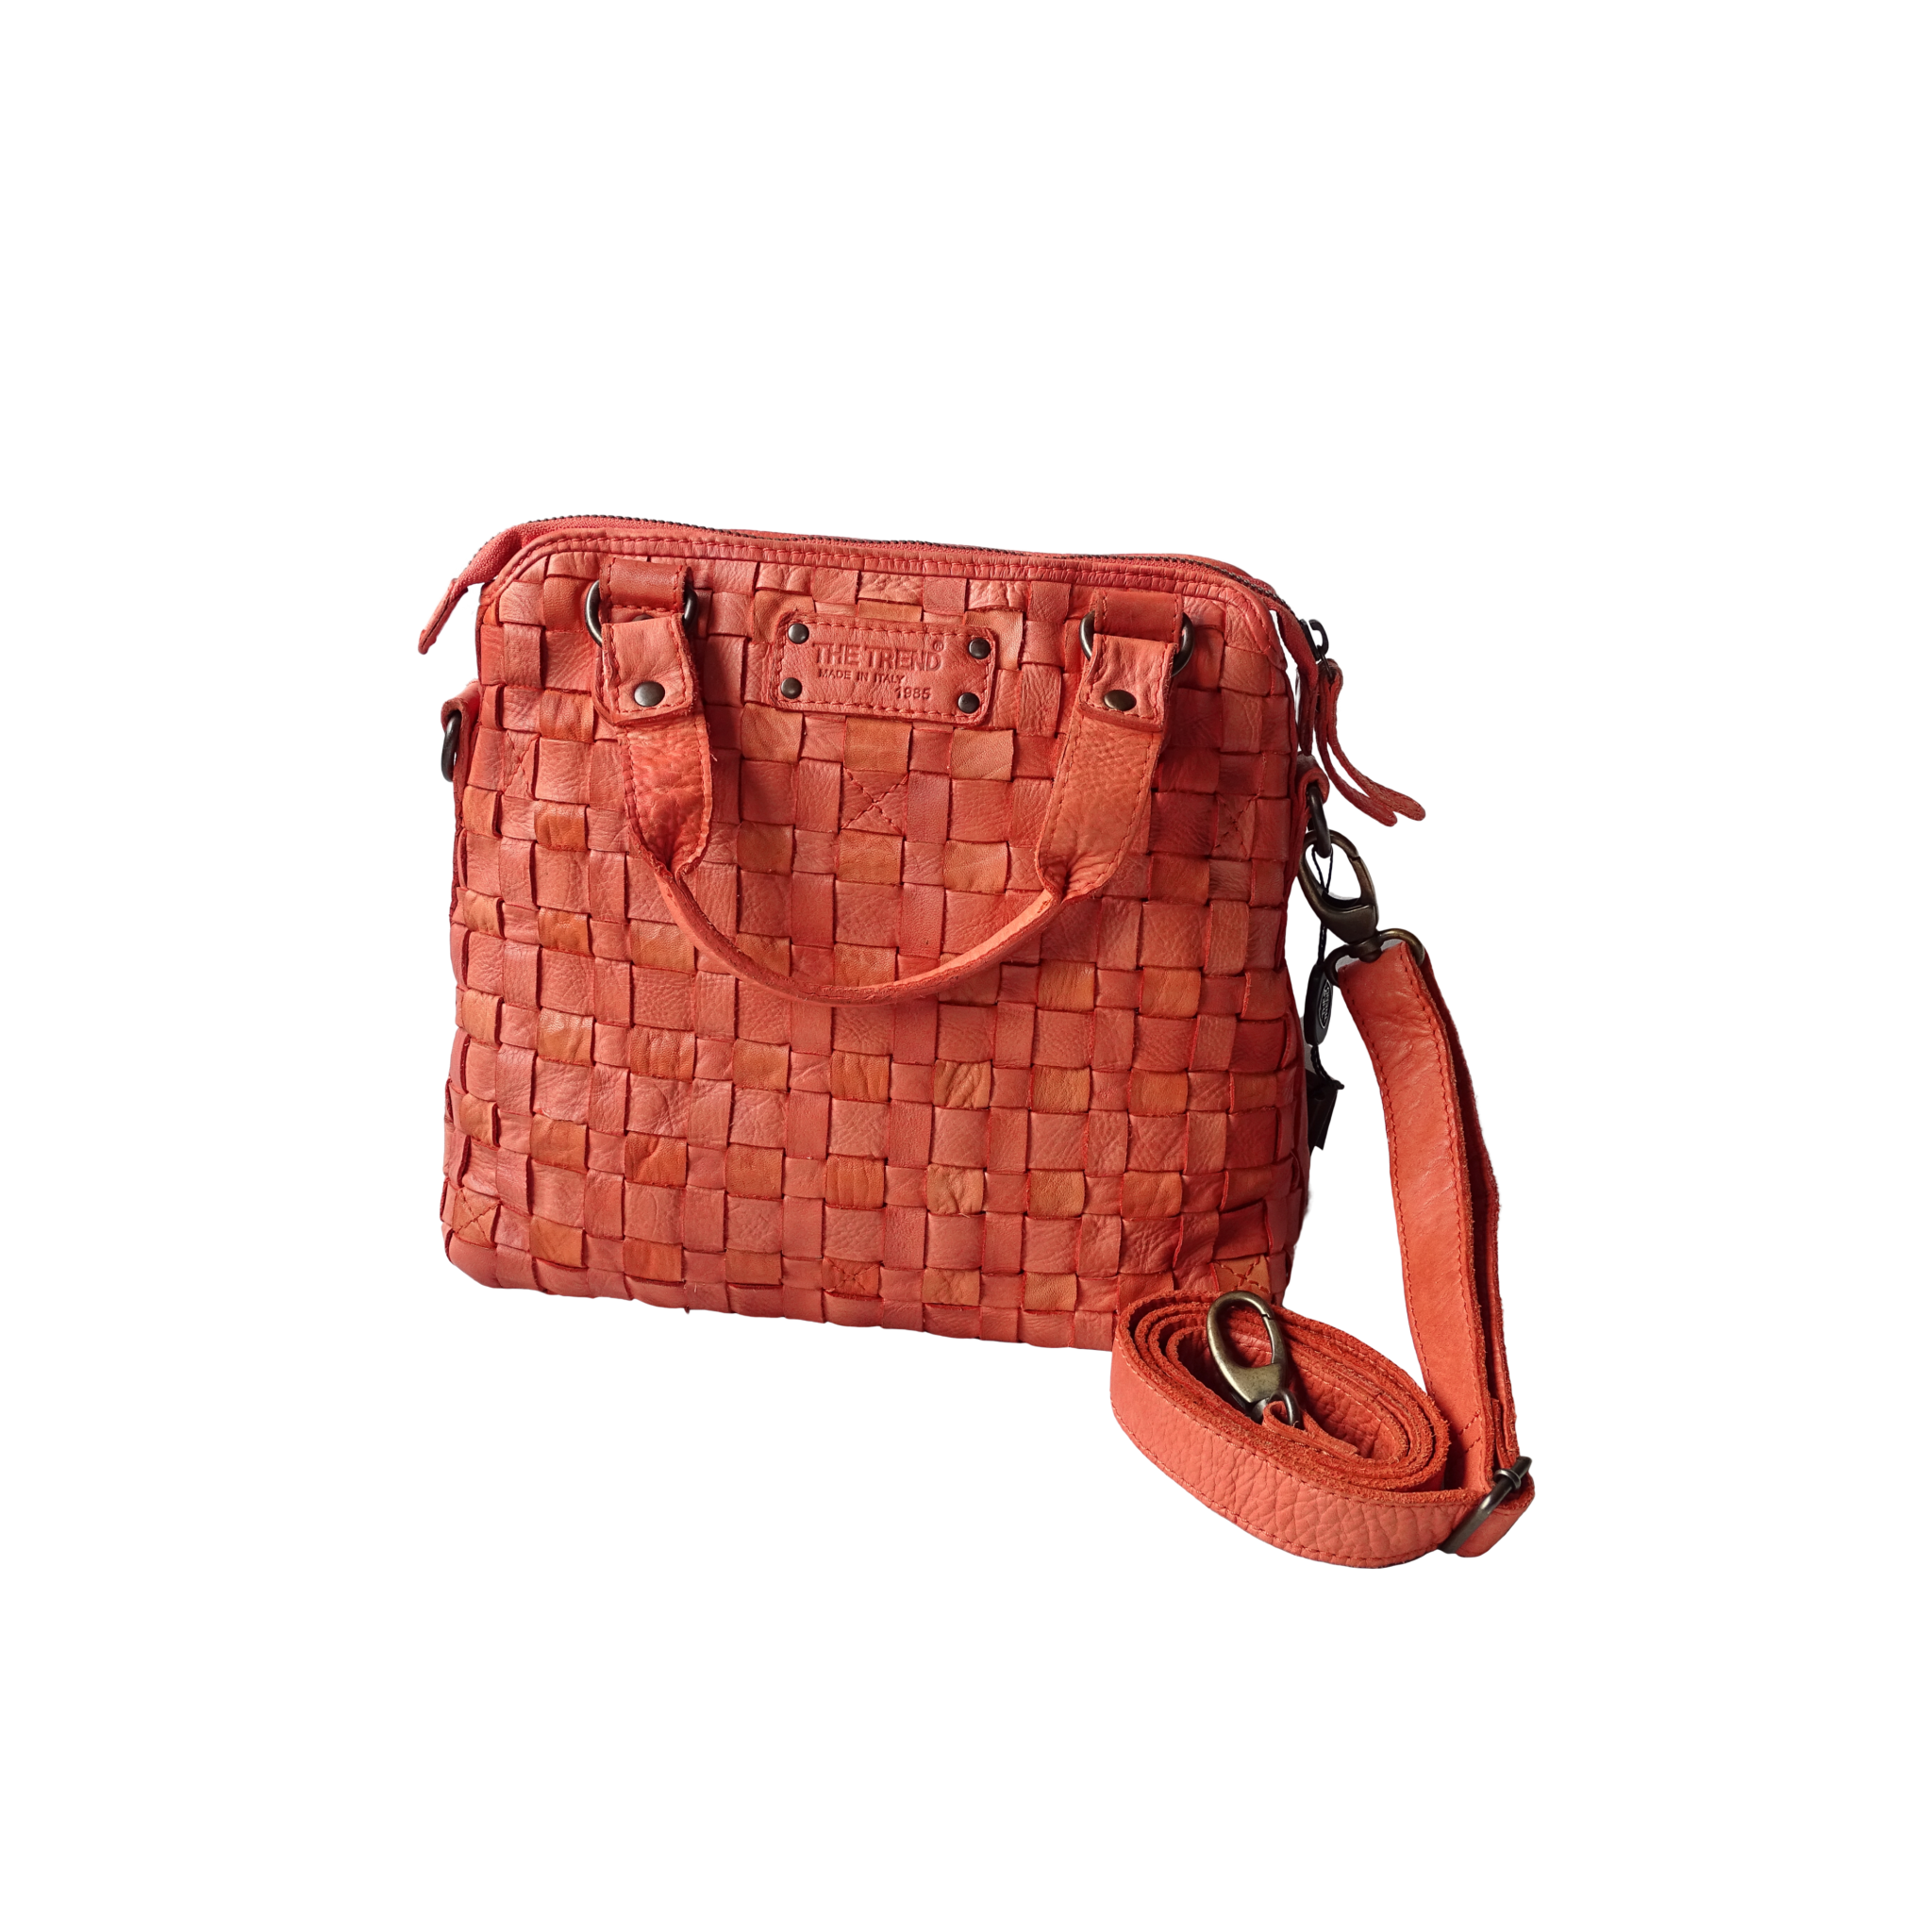 The Trend The Trend handbag tangerine (4503375)